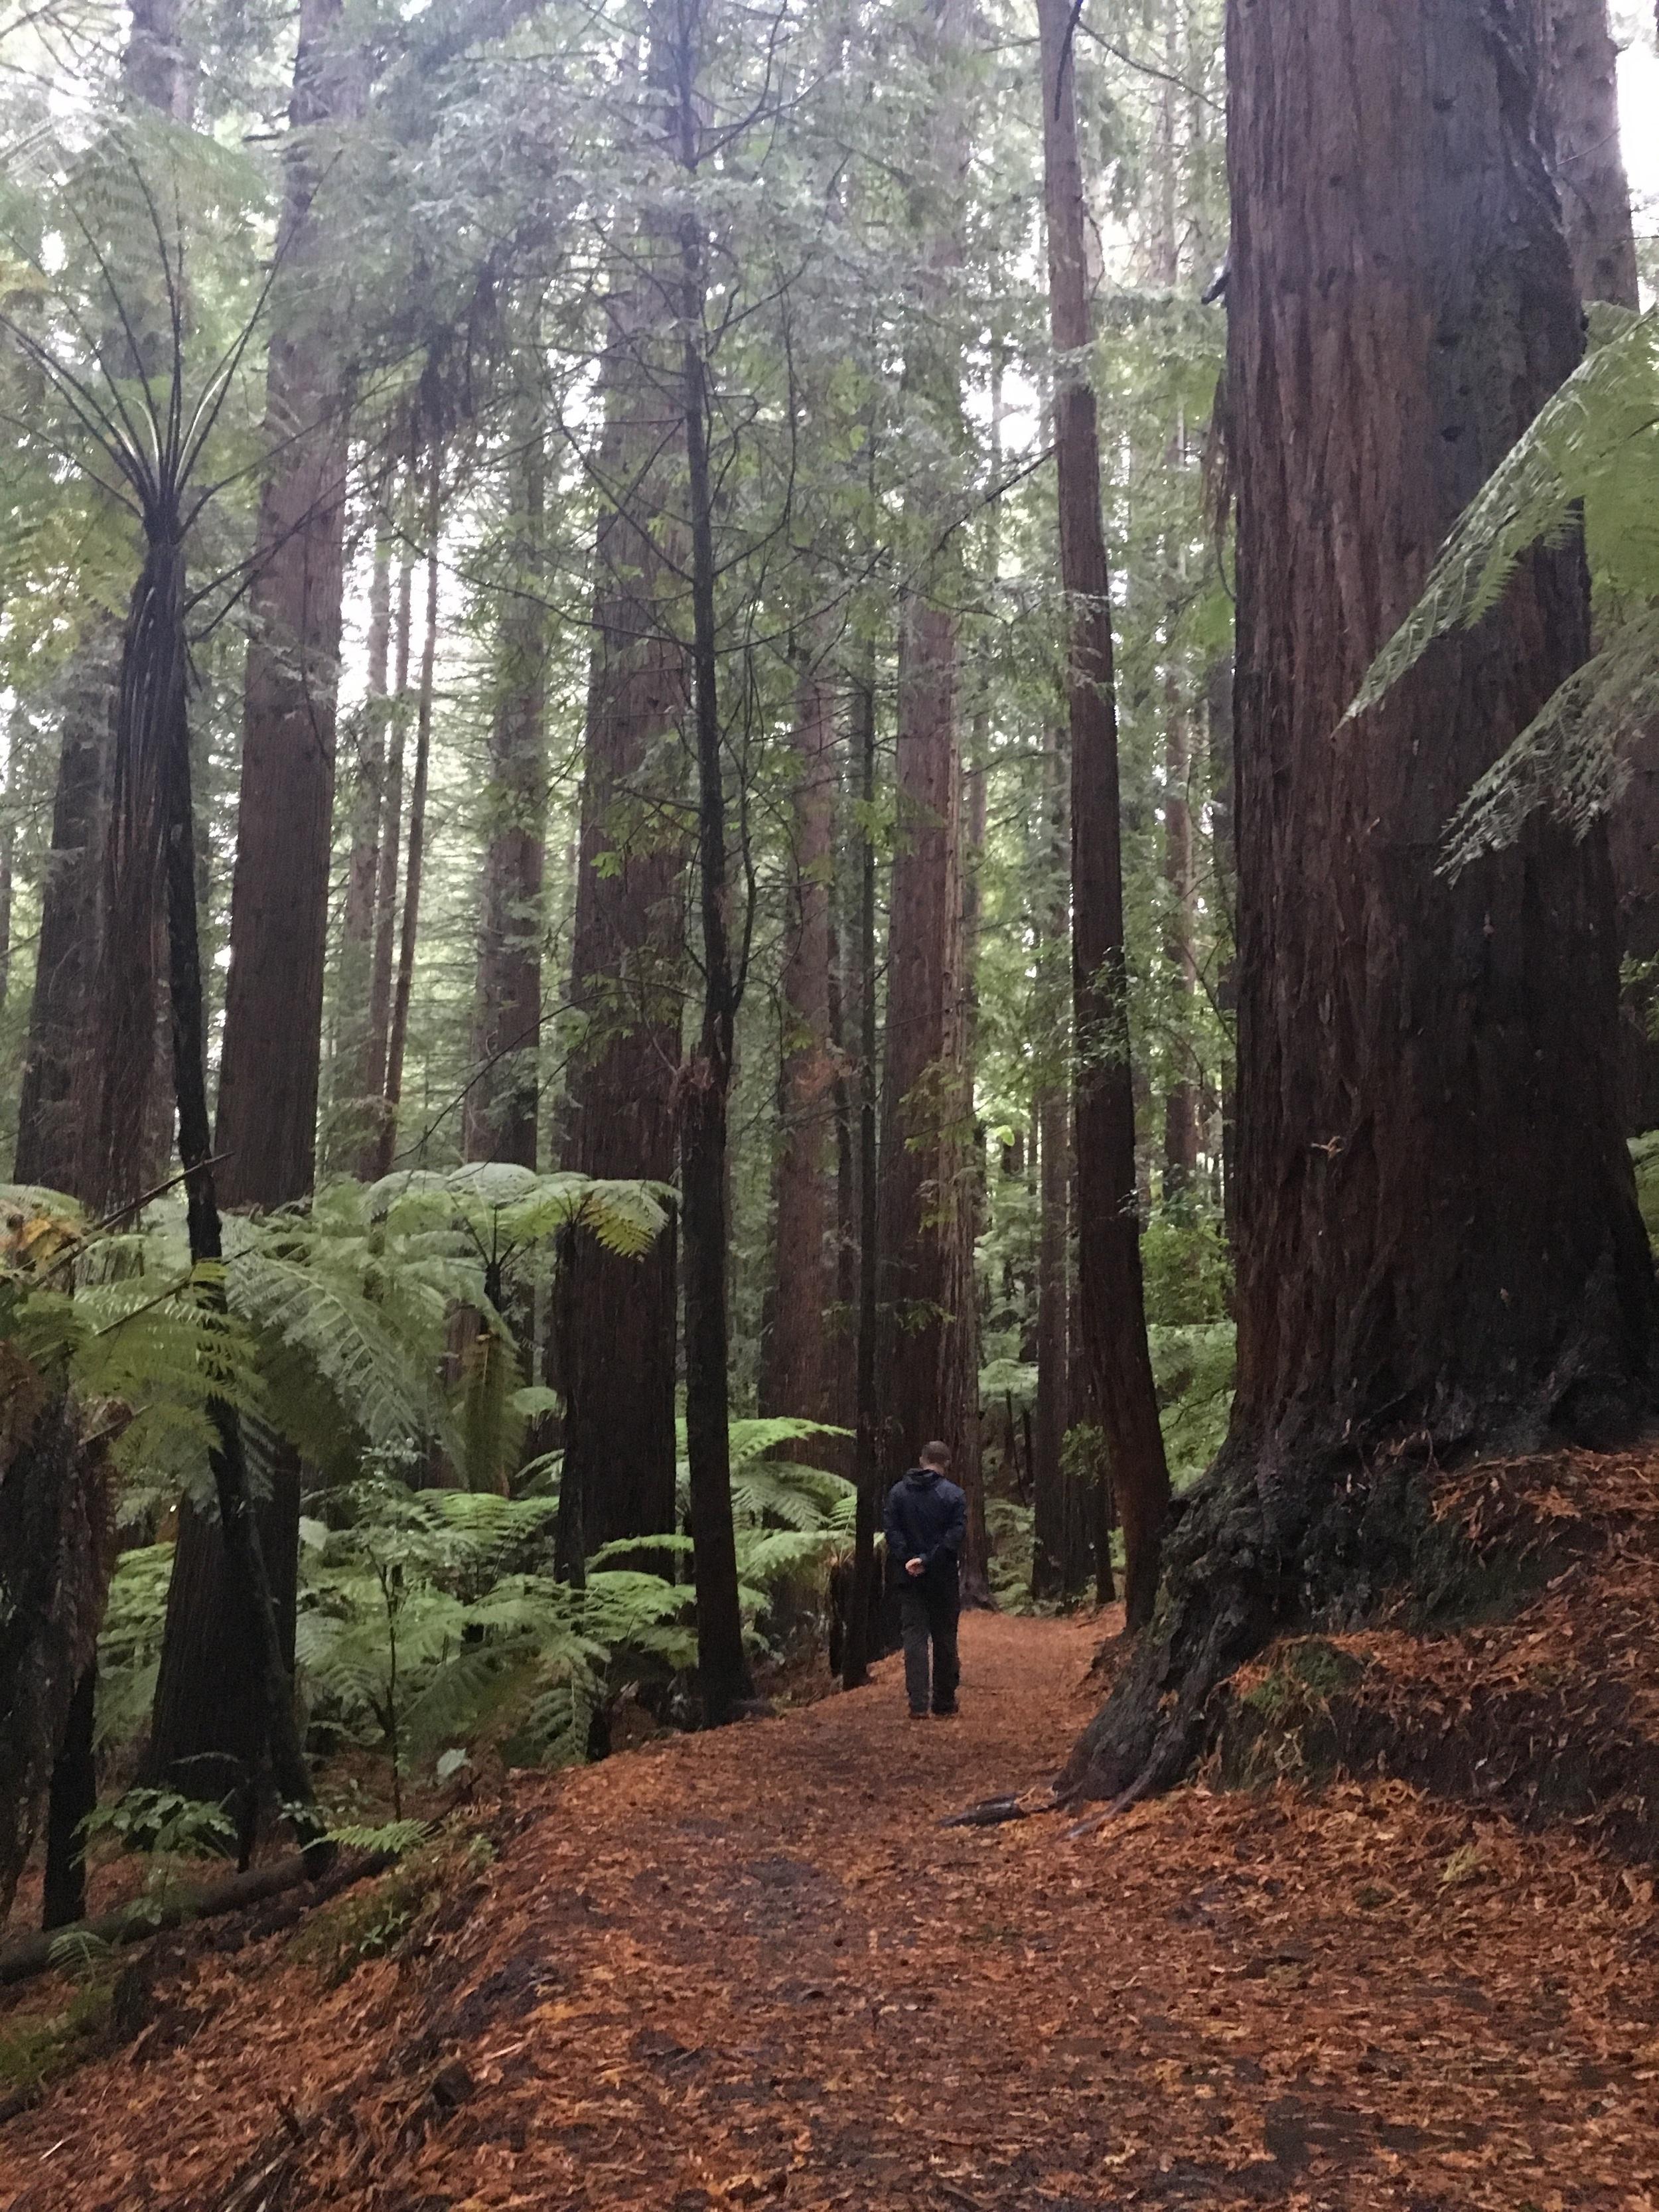 Pondering California in New Zealand